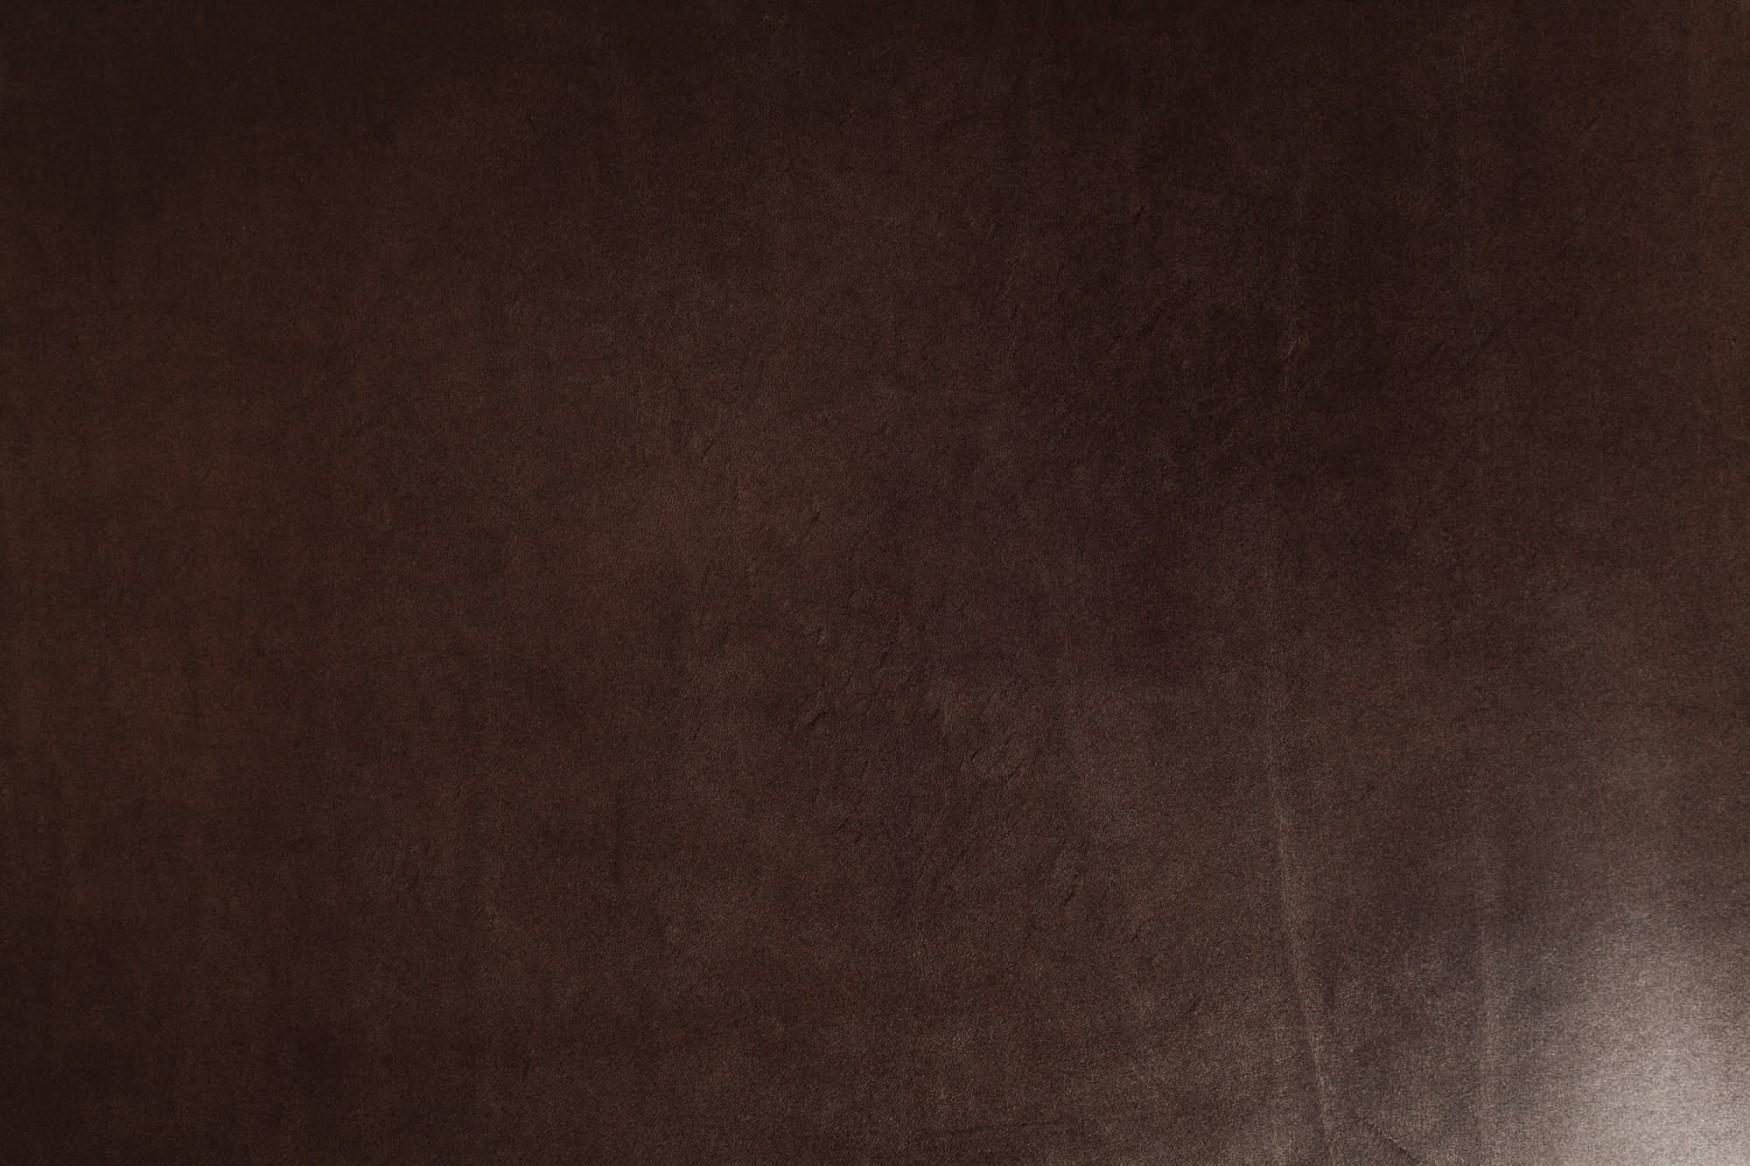 Element7_Leather_Floor_antique-brown